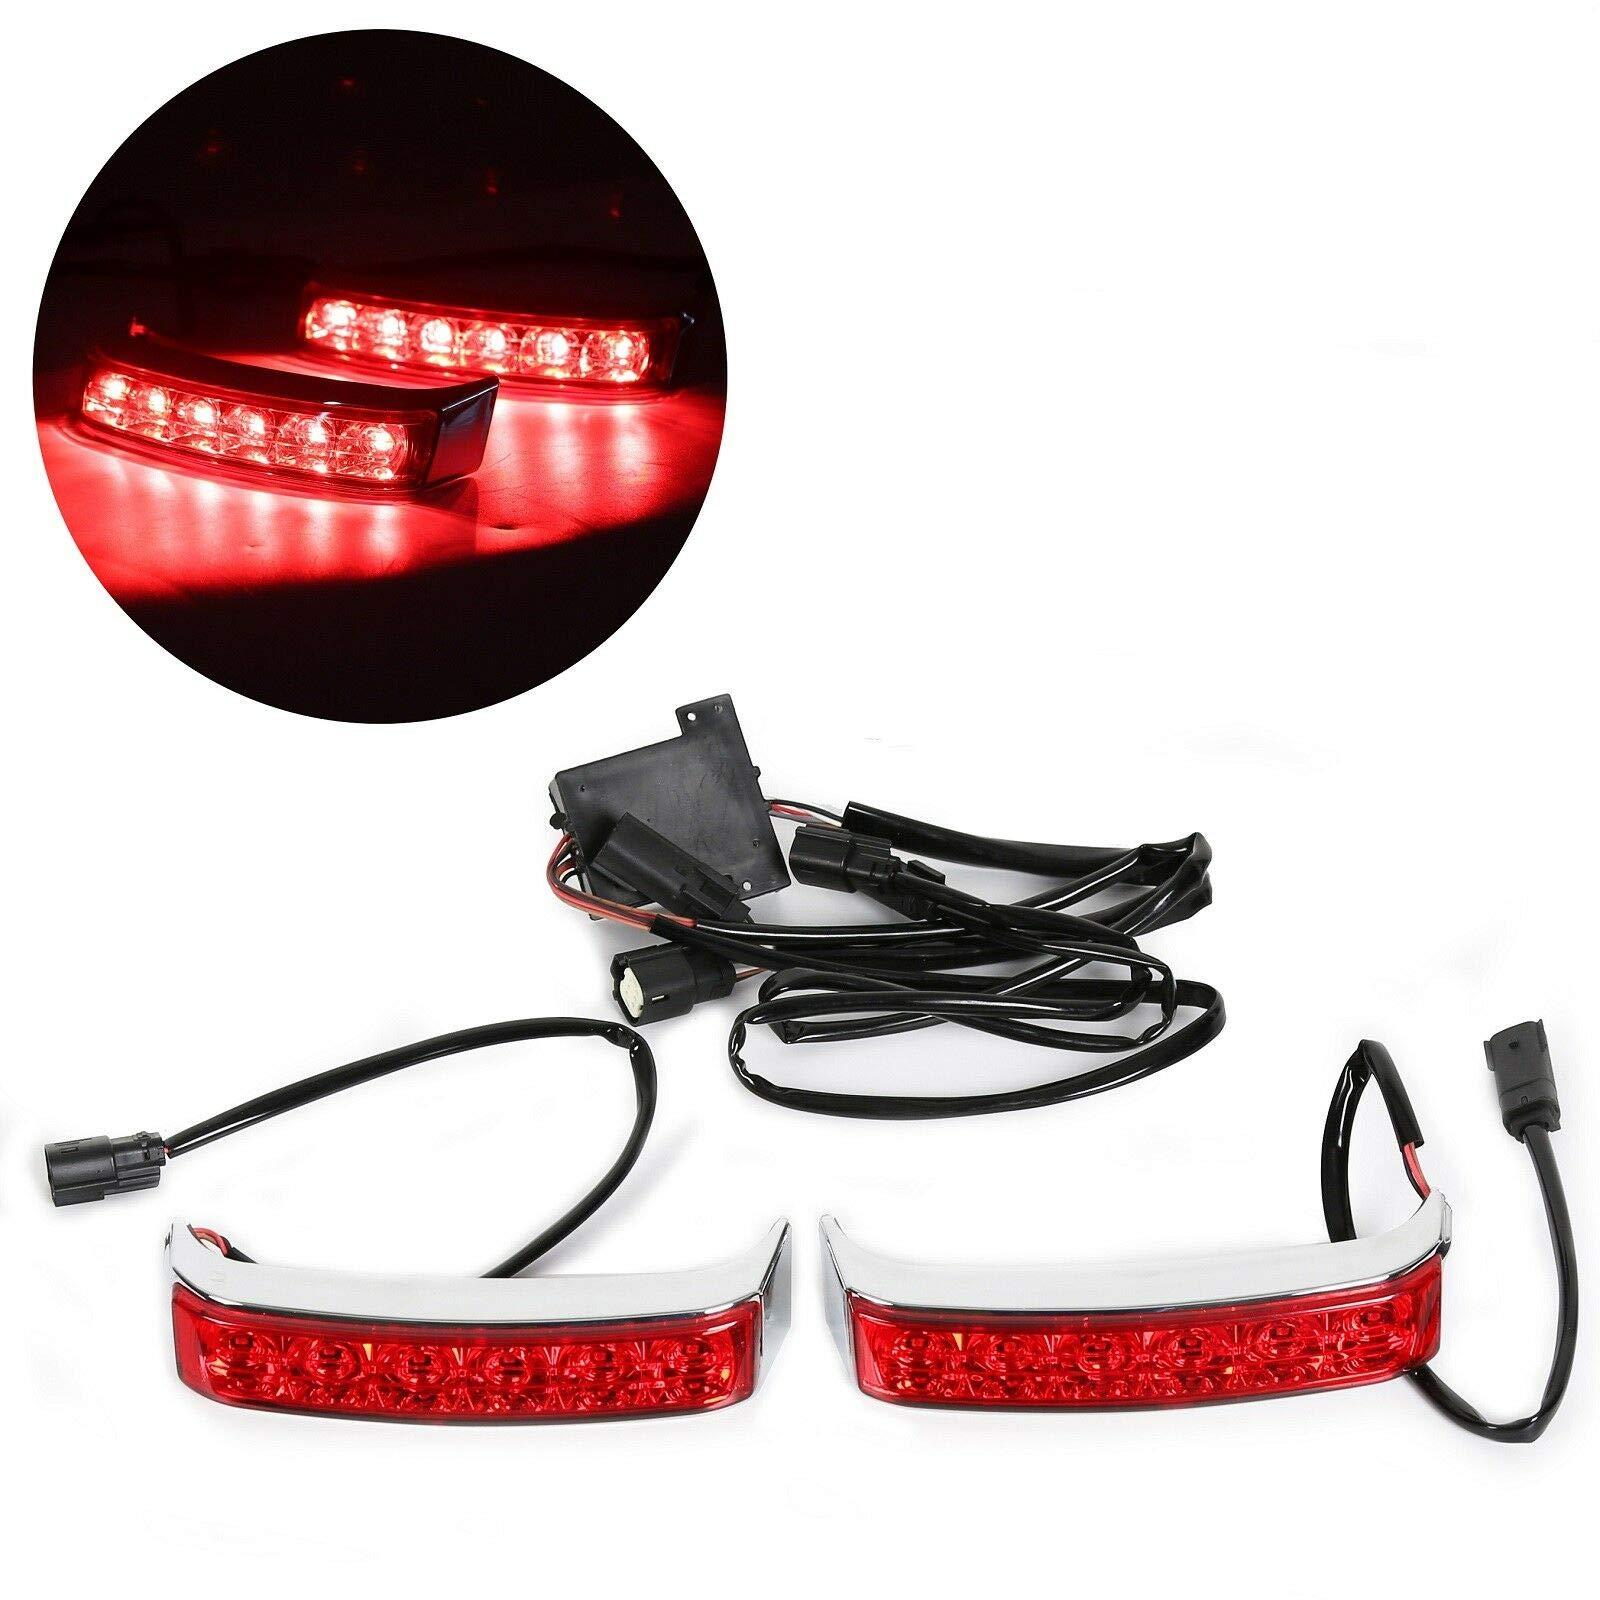 OXMART Saddlebag Tail Lights LED Housing Taillights Lamp For Harley Touring Street Glide Road King 2014-2019 14-19(Chrome Housing/Red Lens) by OXMART